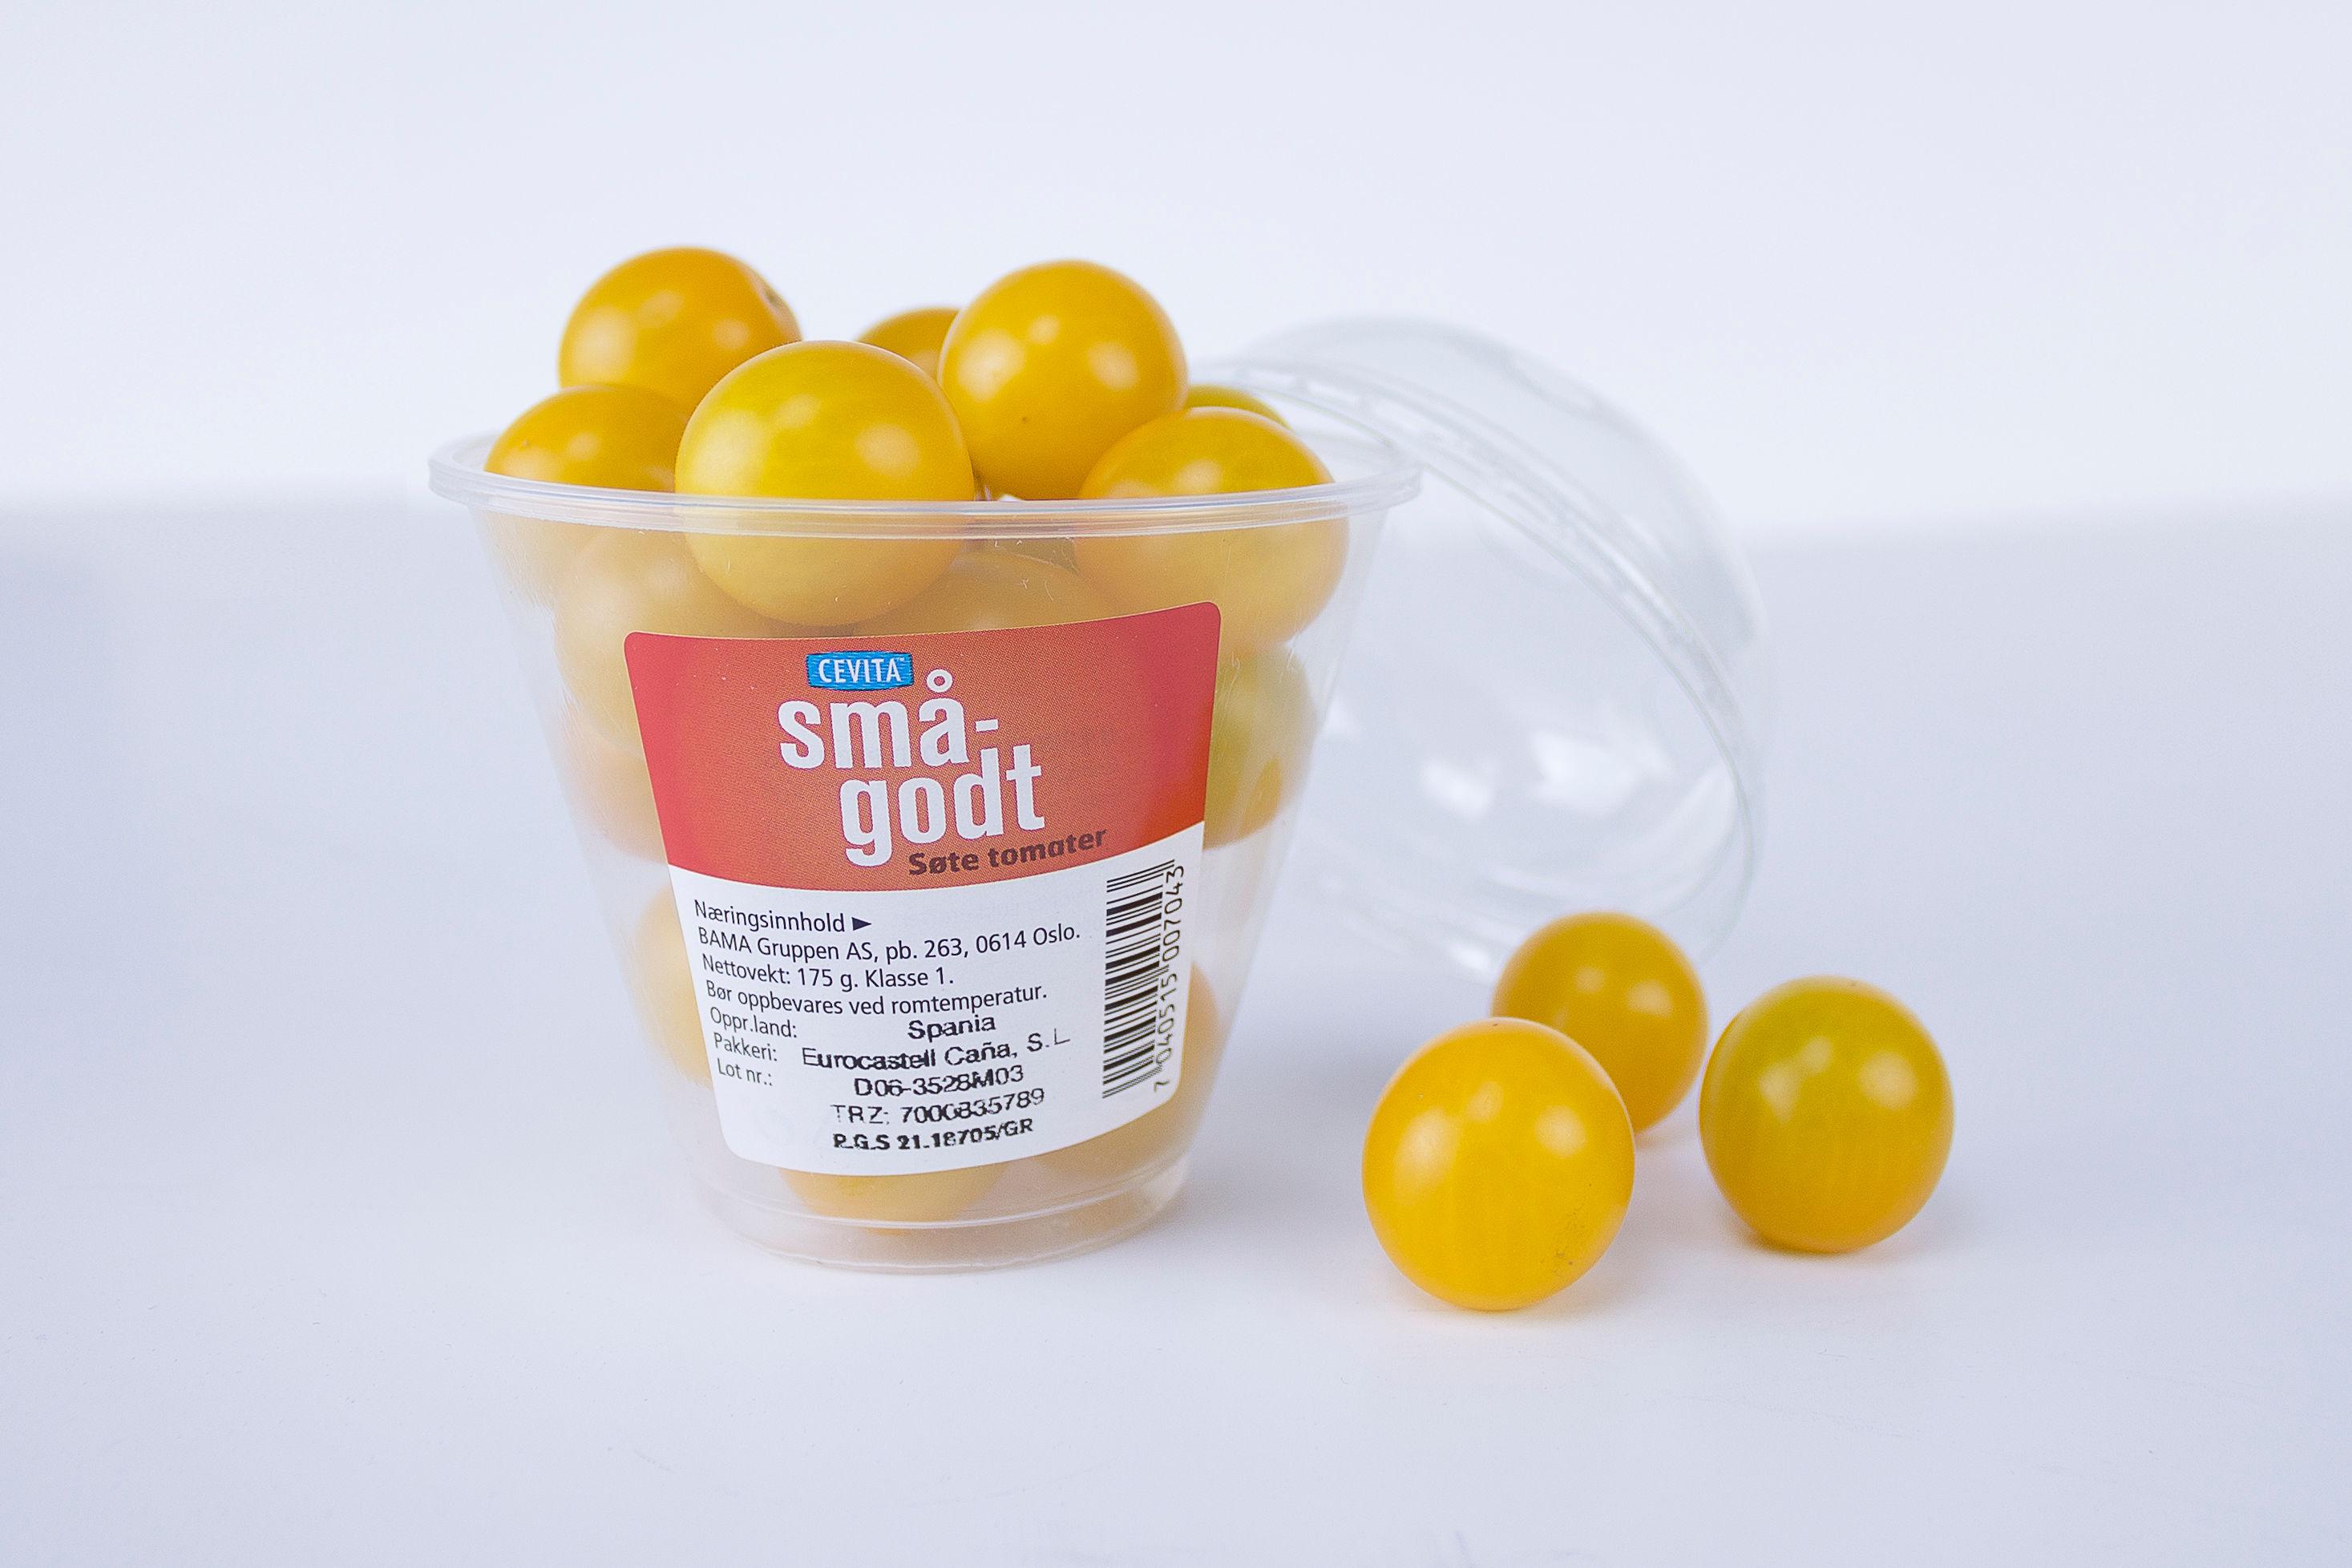 NYHET I SUNT SMÅGODT-SERIEN: Søte, gule tomater i praktisk beger